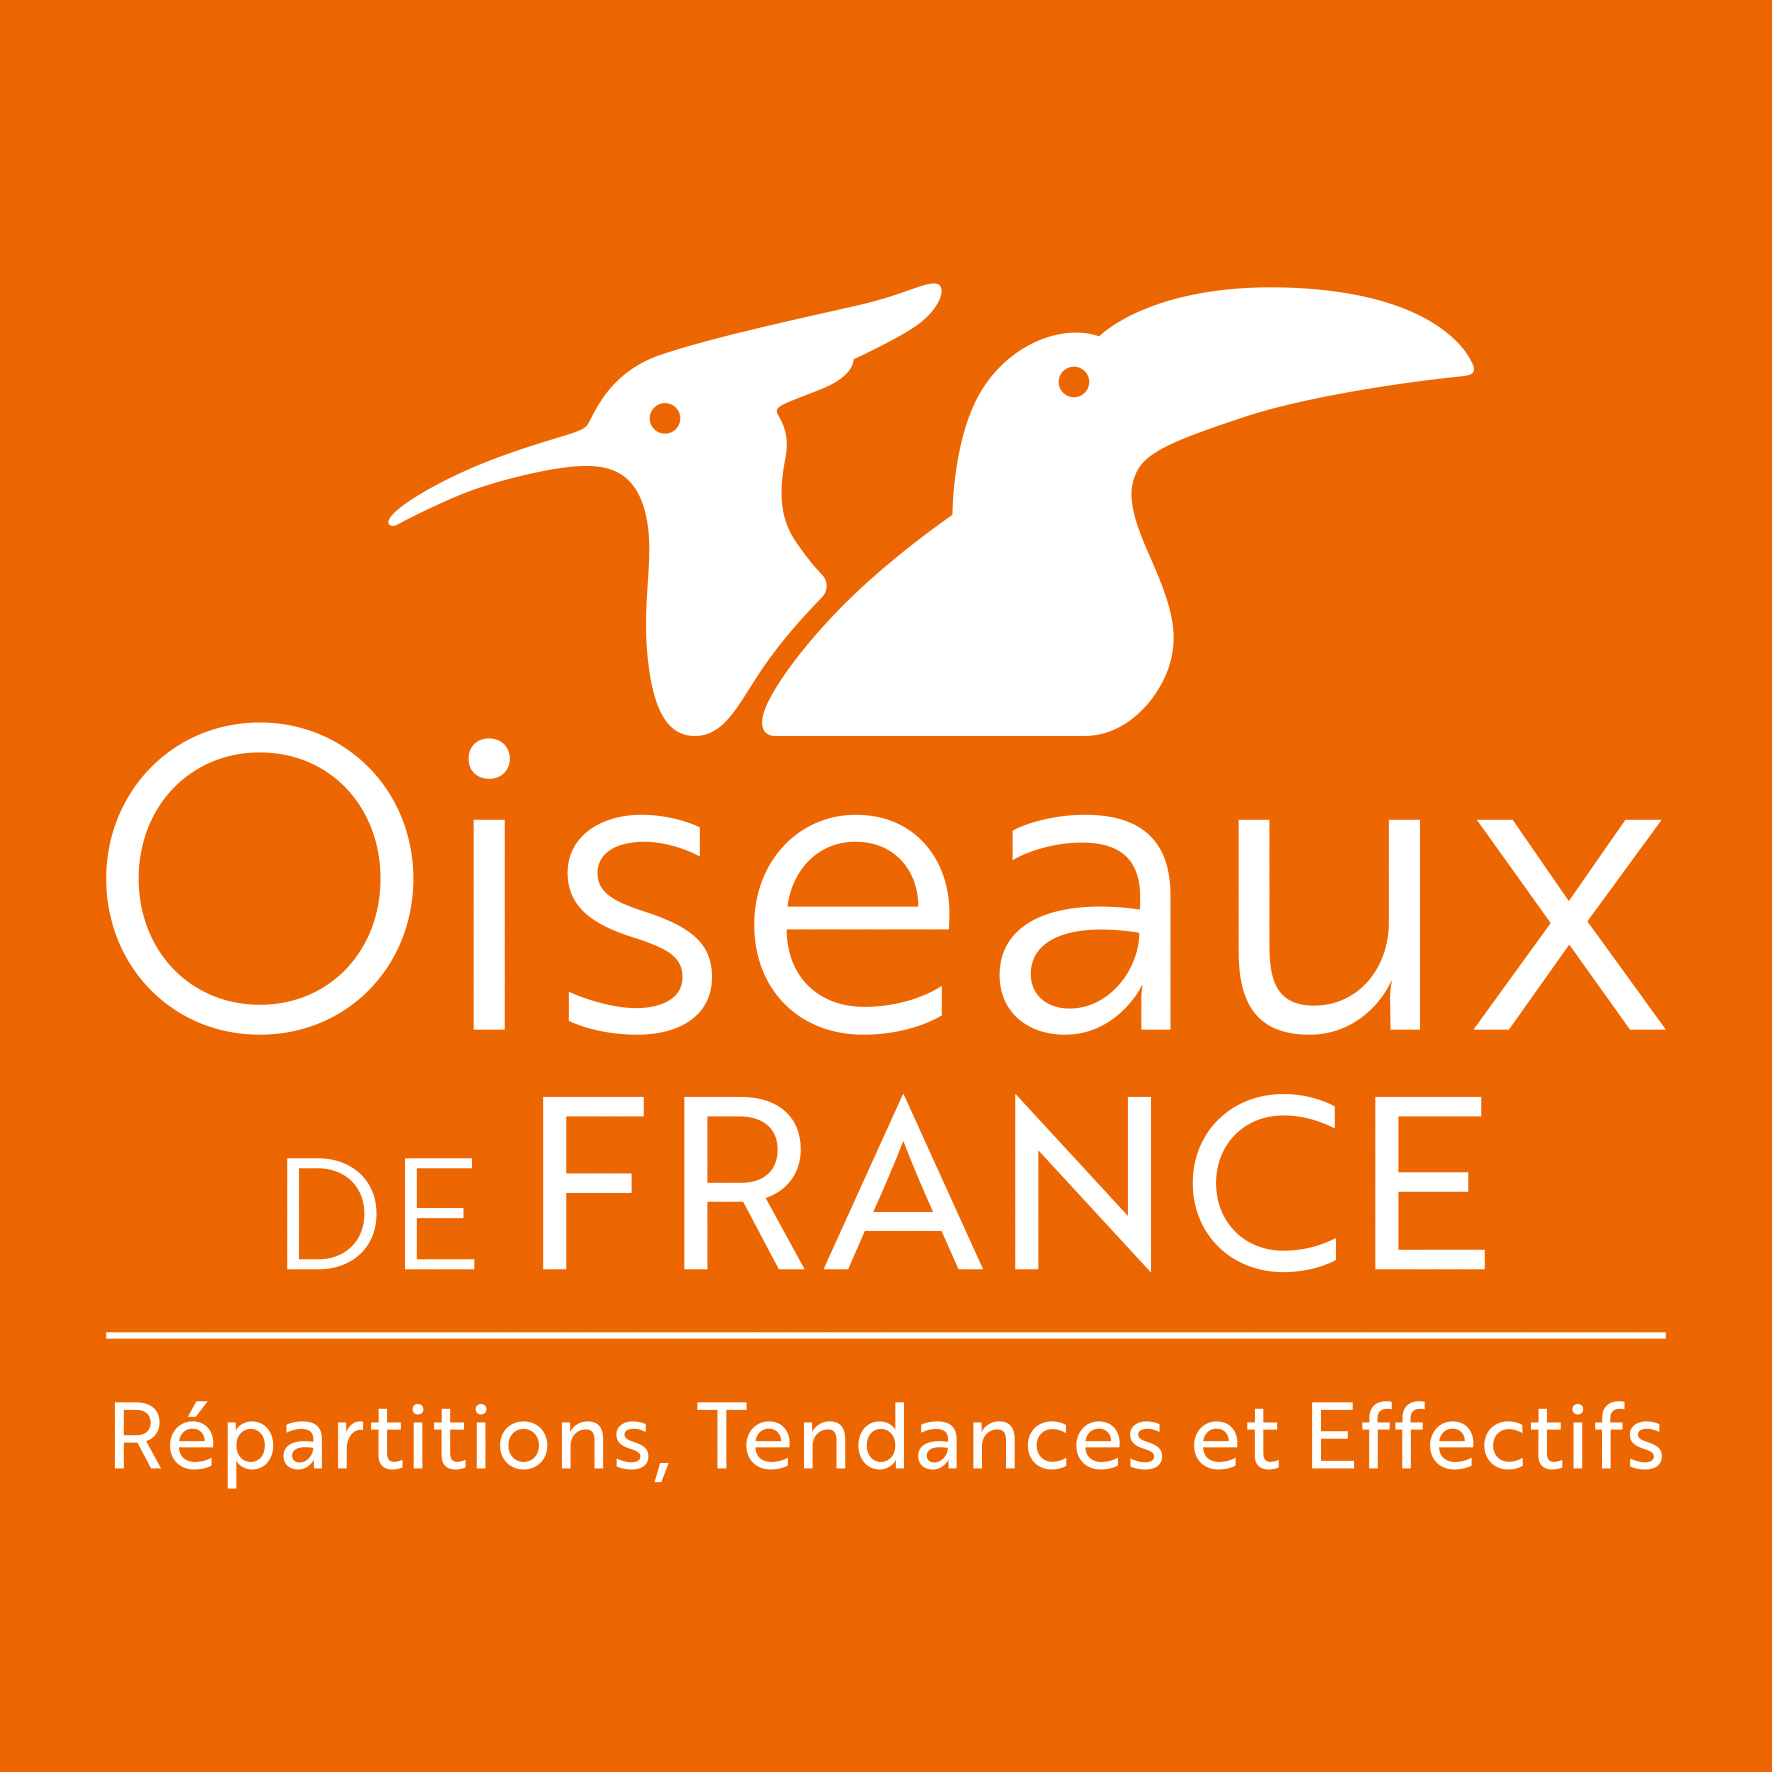 https://cdnfiles1.biolovision.net/www.faune-france.org/userfiles/FauneFrance/FFAltasEnqutes/OiseauxDeFranceBloc.jpg